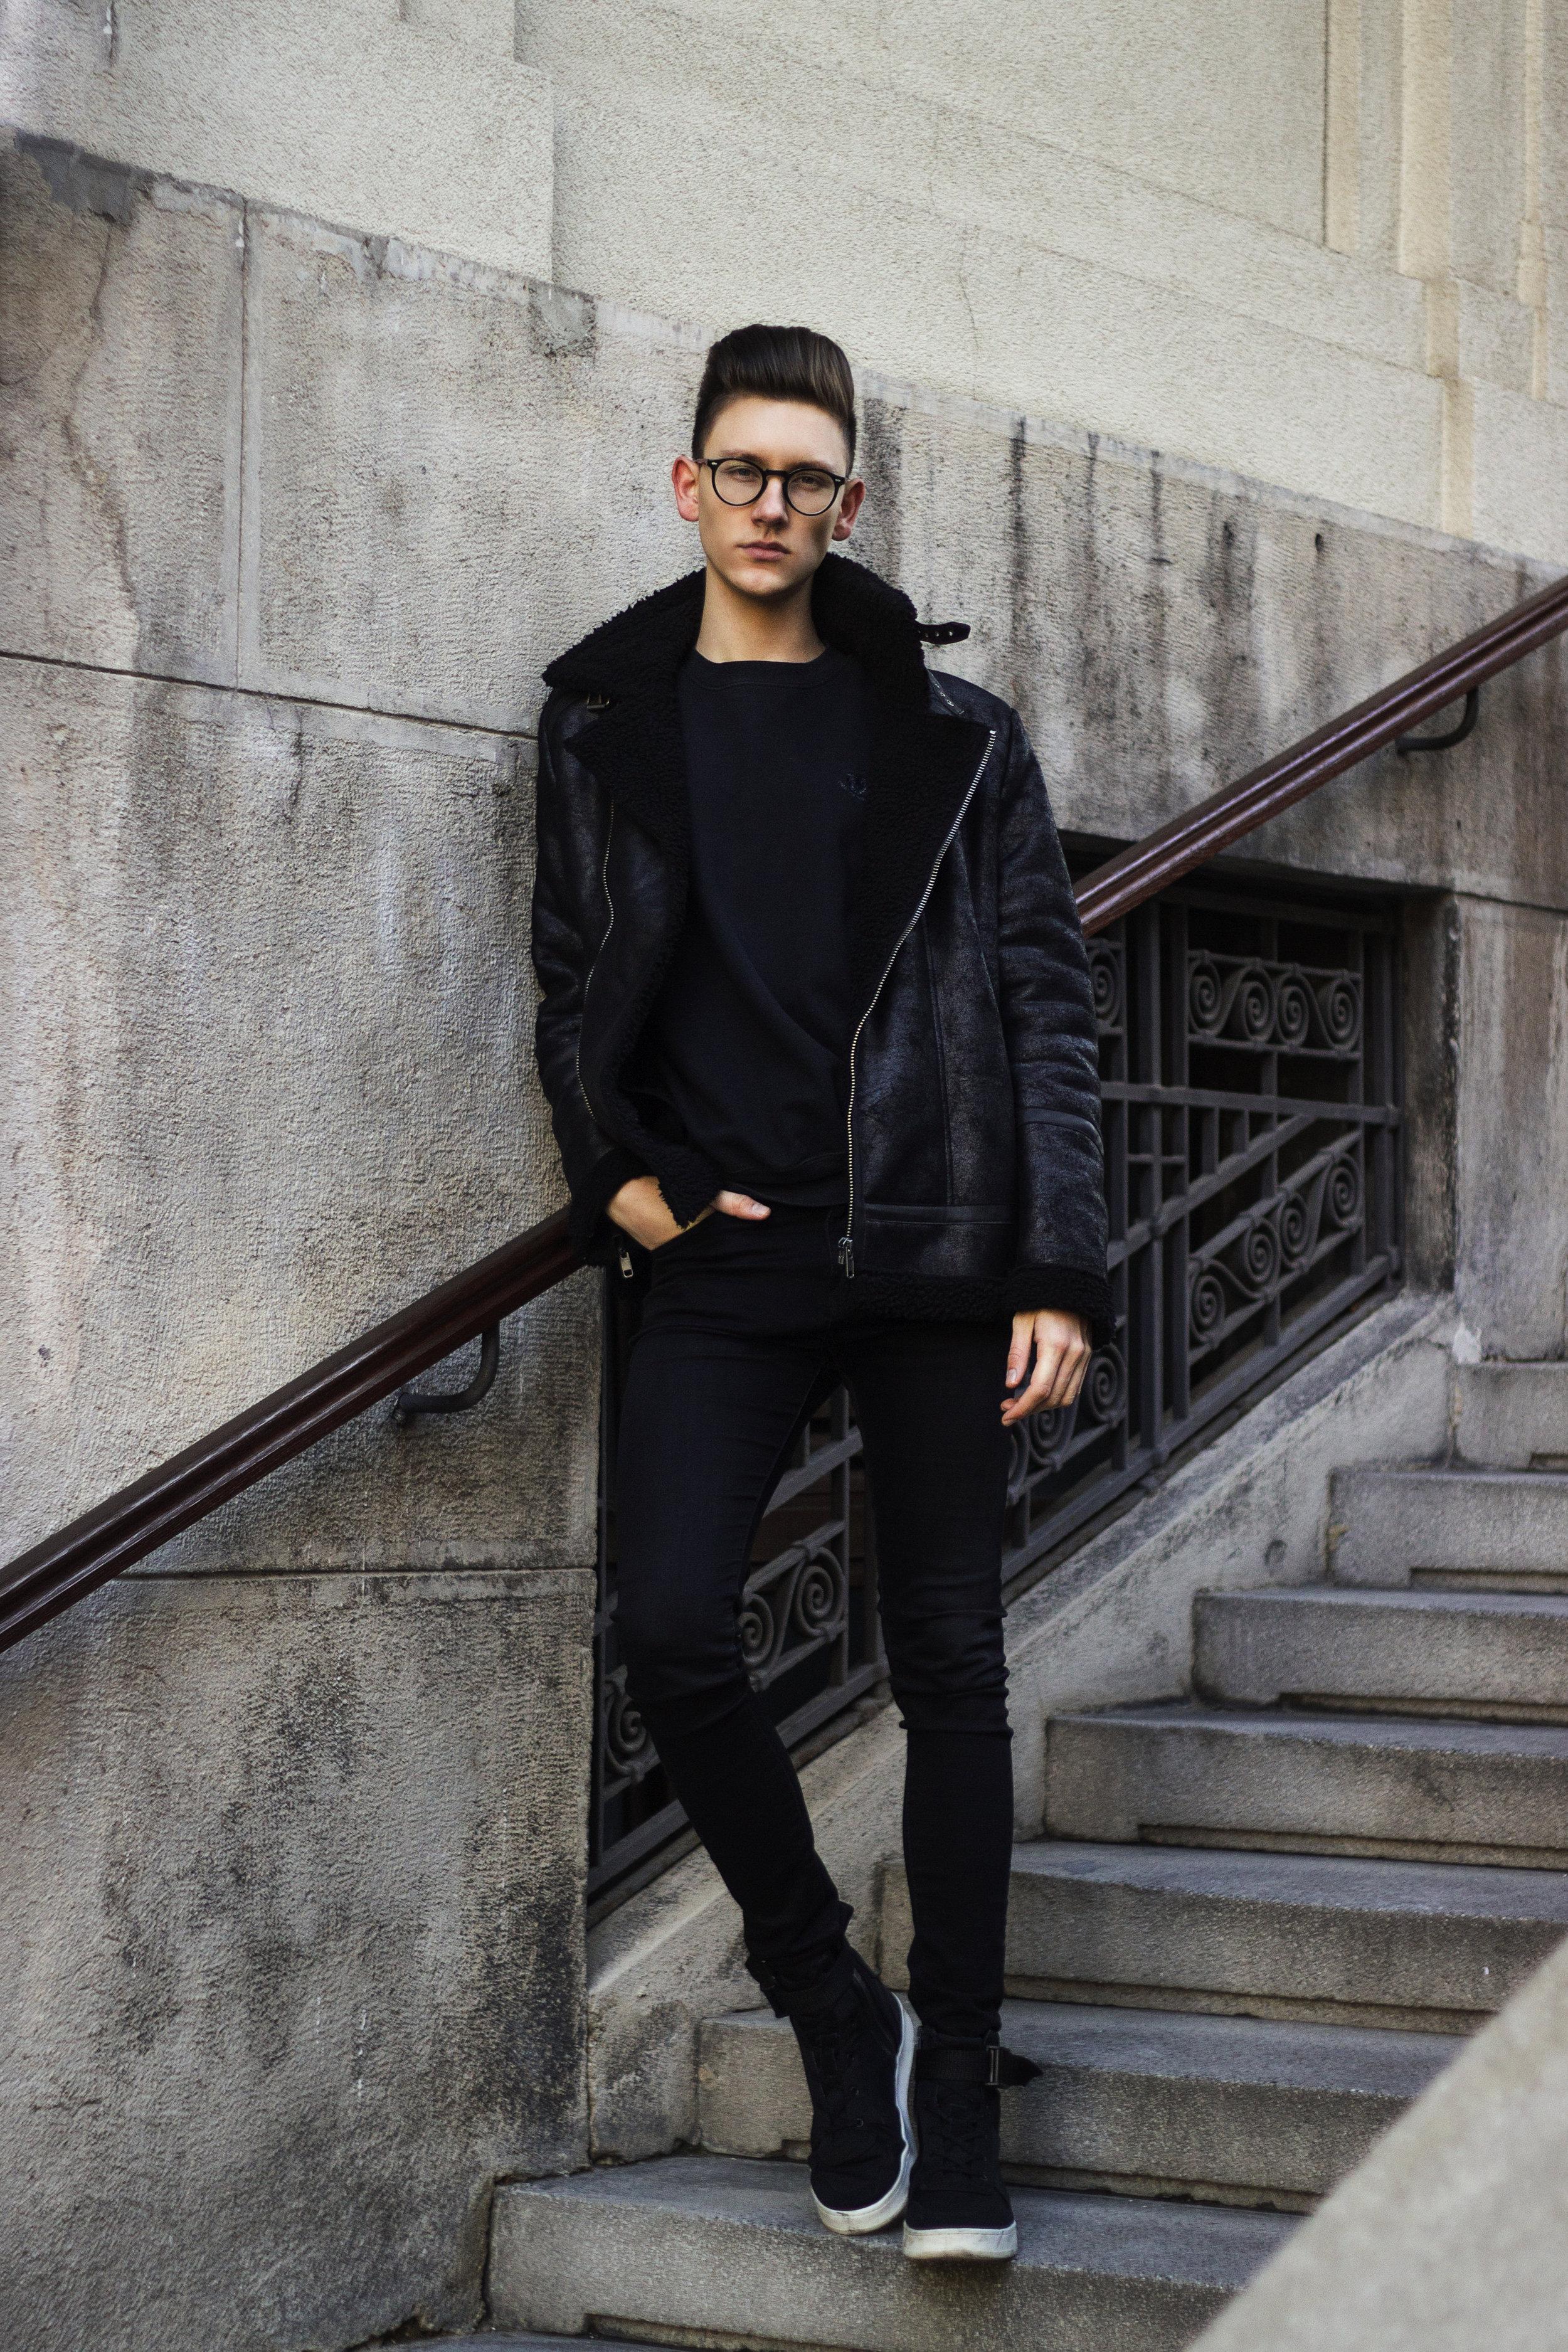 luka-lajic-expensive-reality-hm-mens-fashion-croatia-blogger (4).jpg